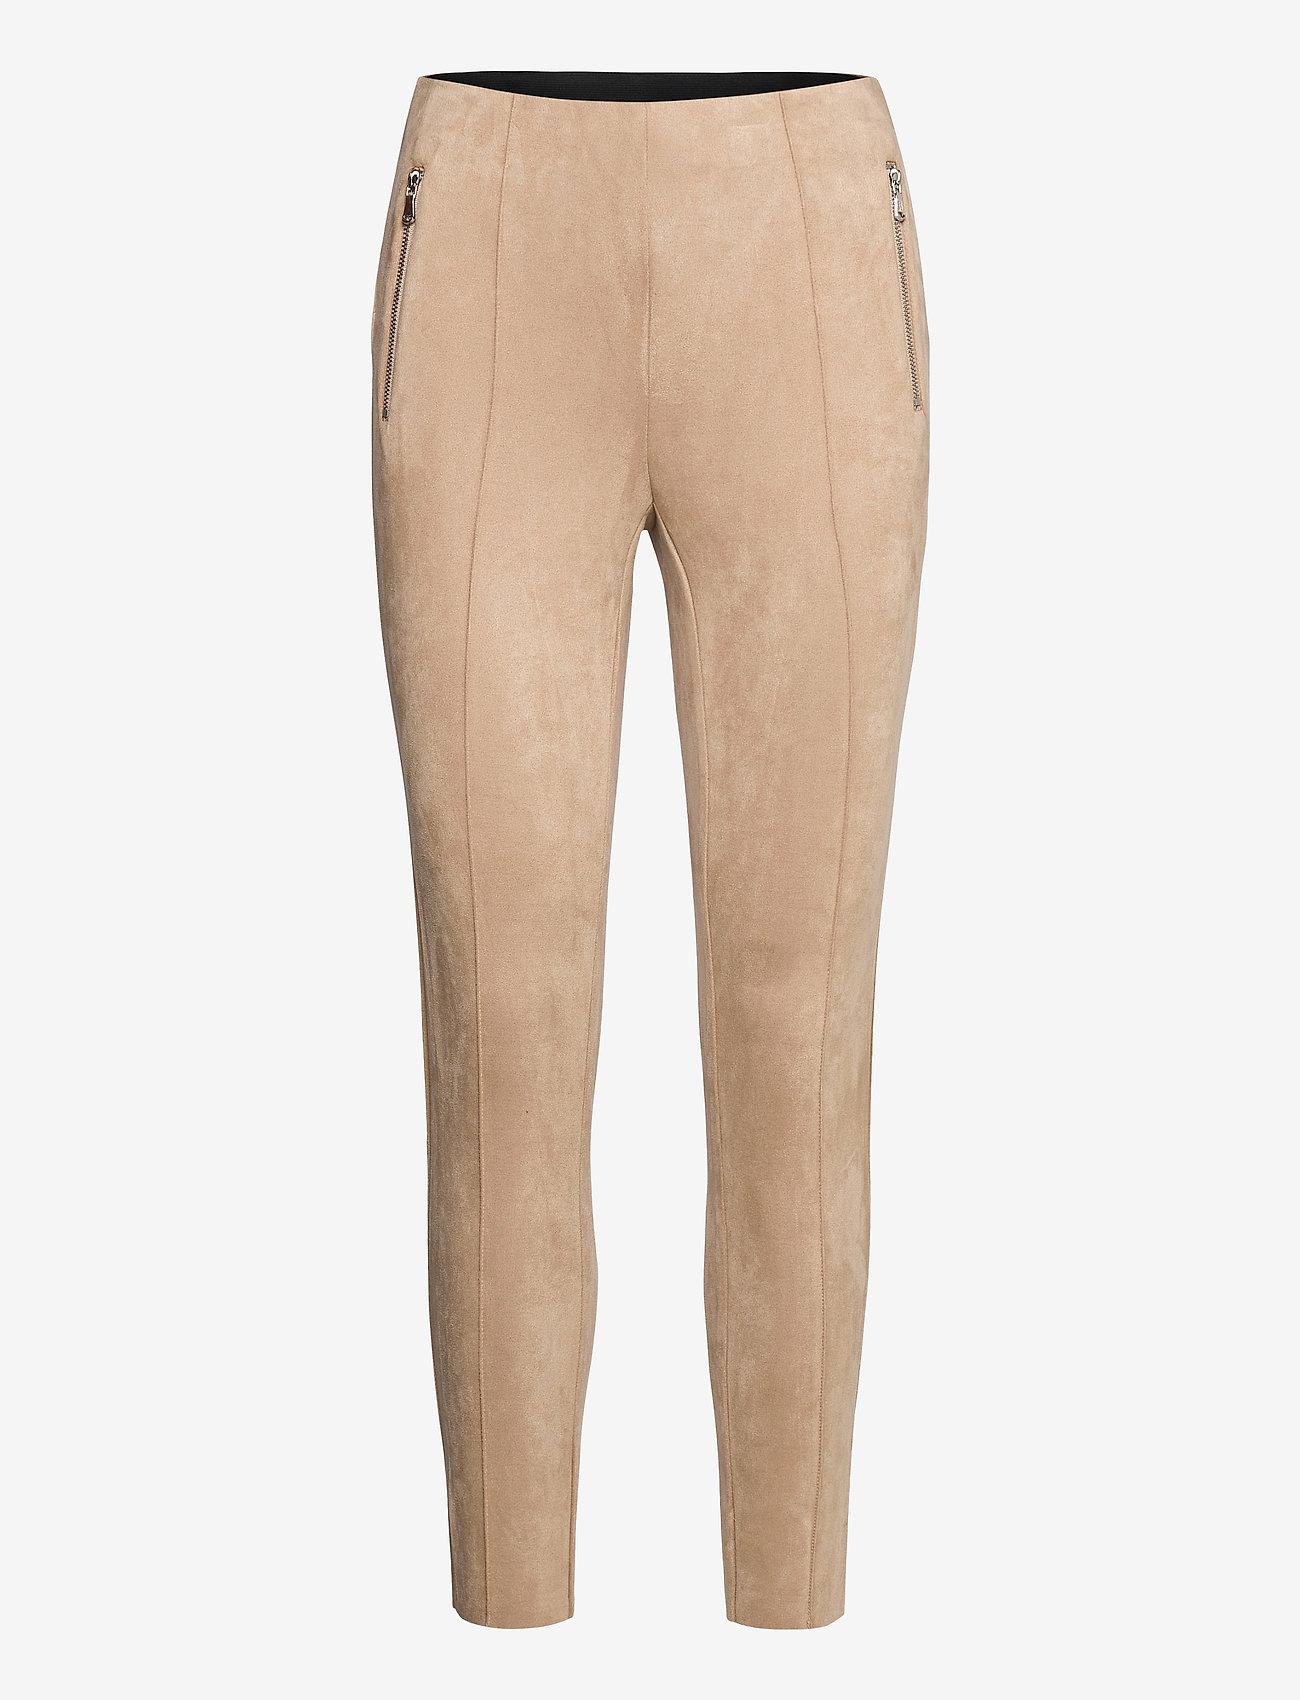 Vero Moda - VMCAVA ZIP NW FAUX SUEDE LEGGING JRS BOO - leggings - nomad - 0